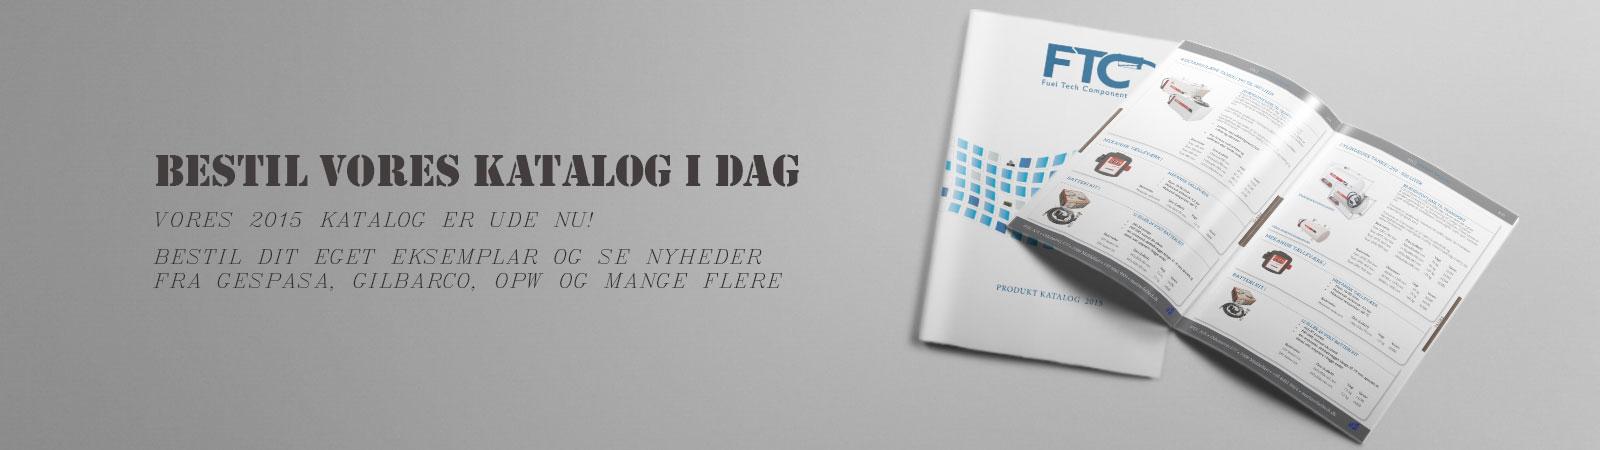 brochure-baggrund1600x450